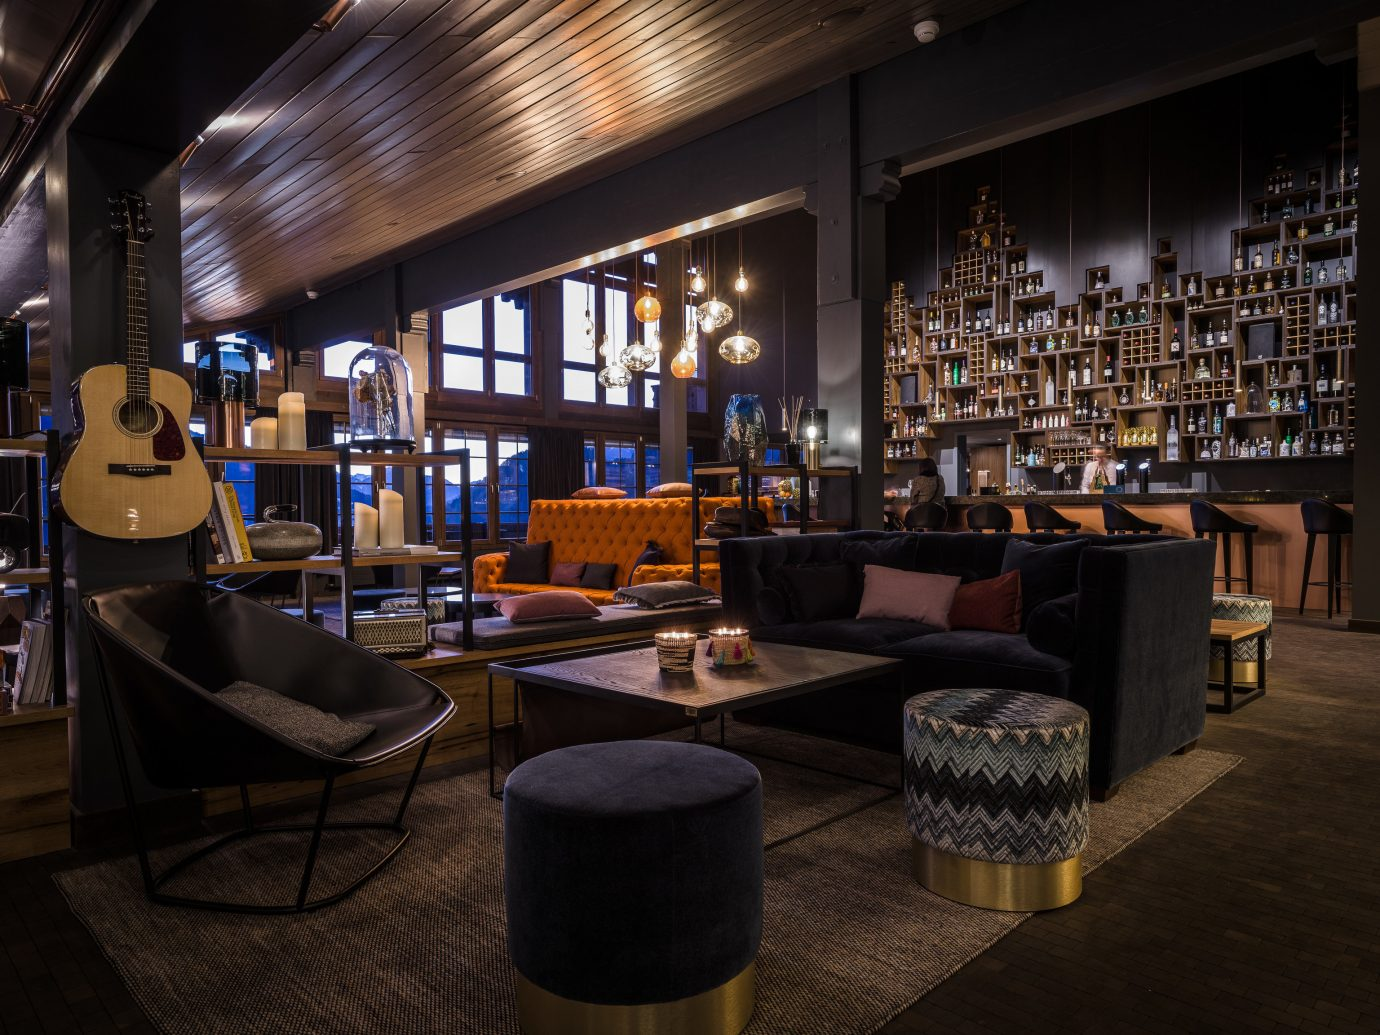 Boutique Hotels Hotels Outdoors + Adventure Winter indoor ceiling floor window room interior design restaurant Bar furniture table area